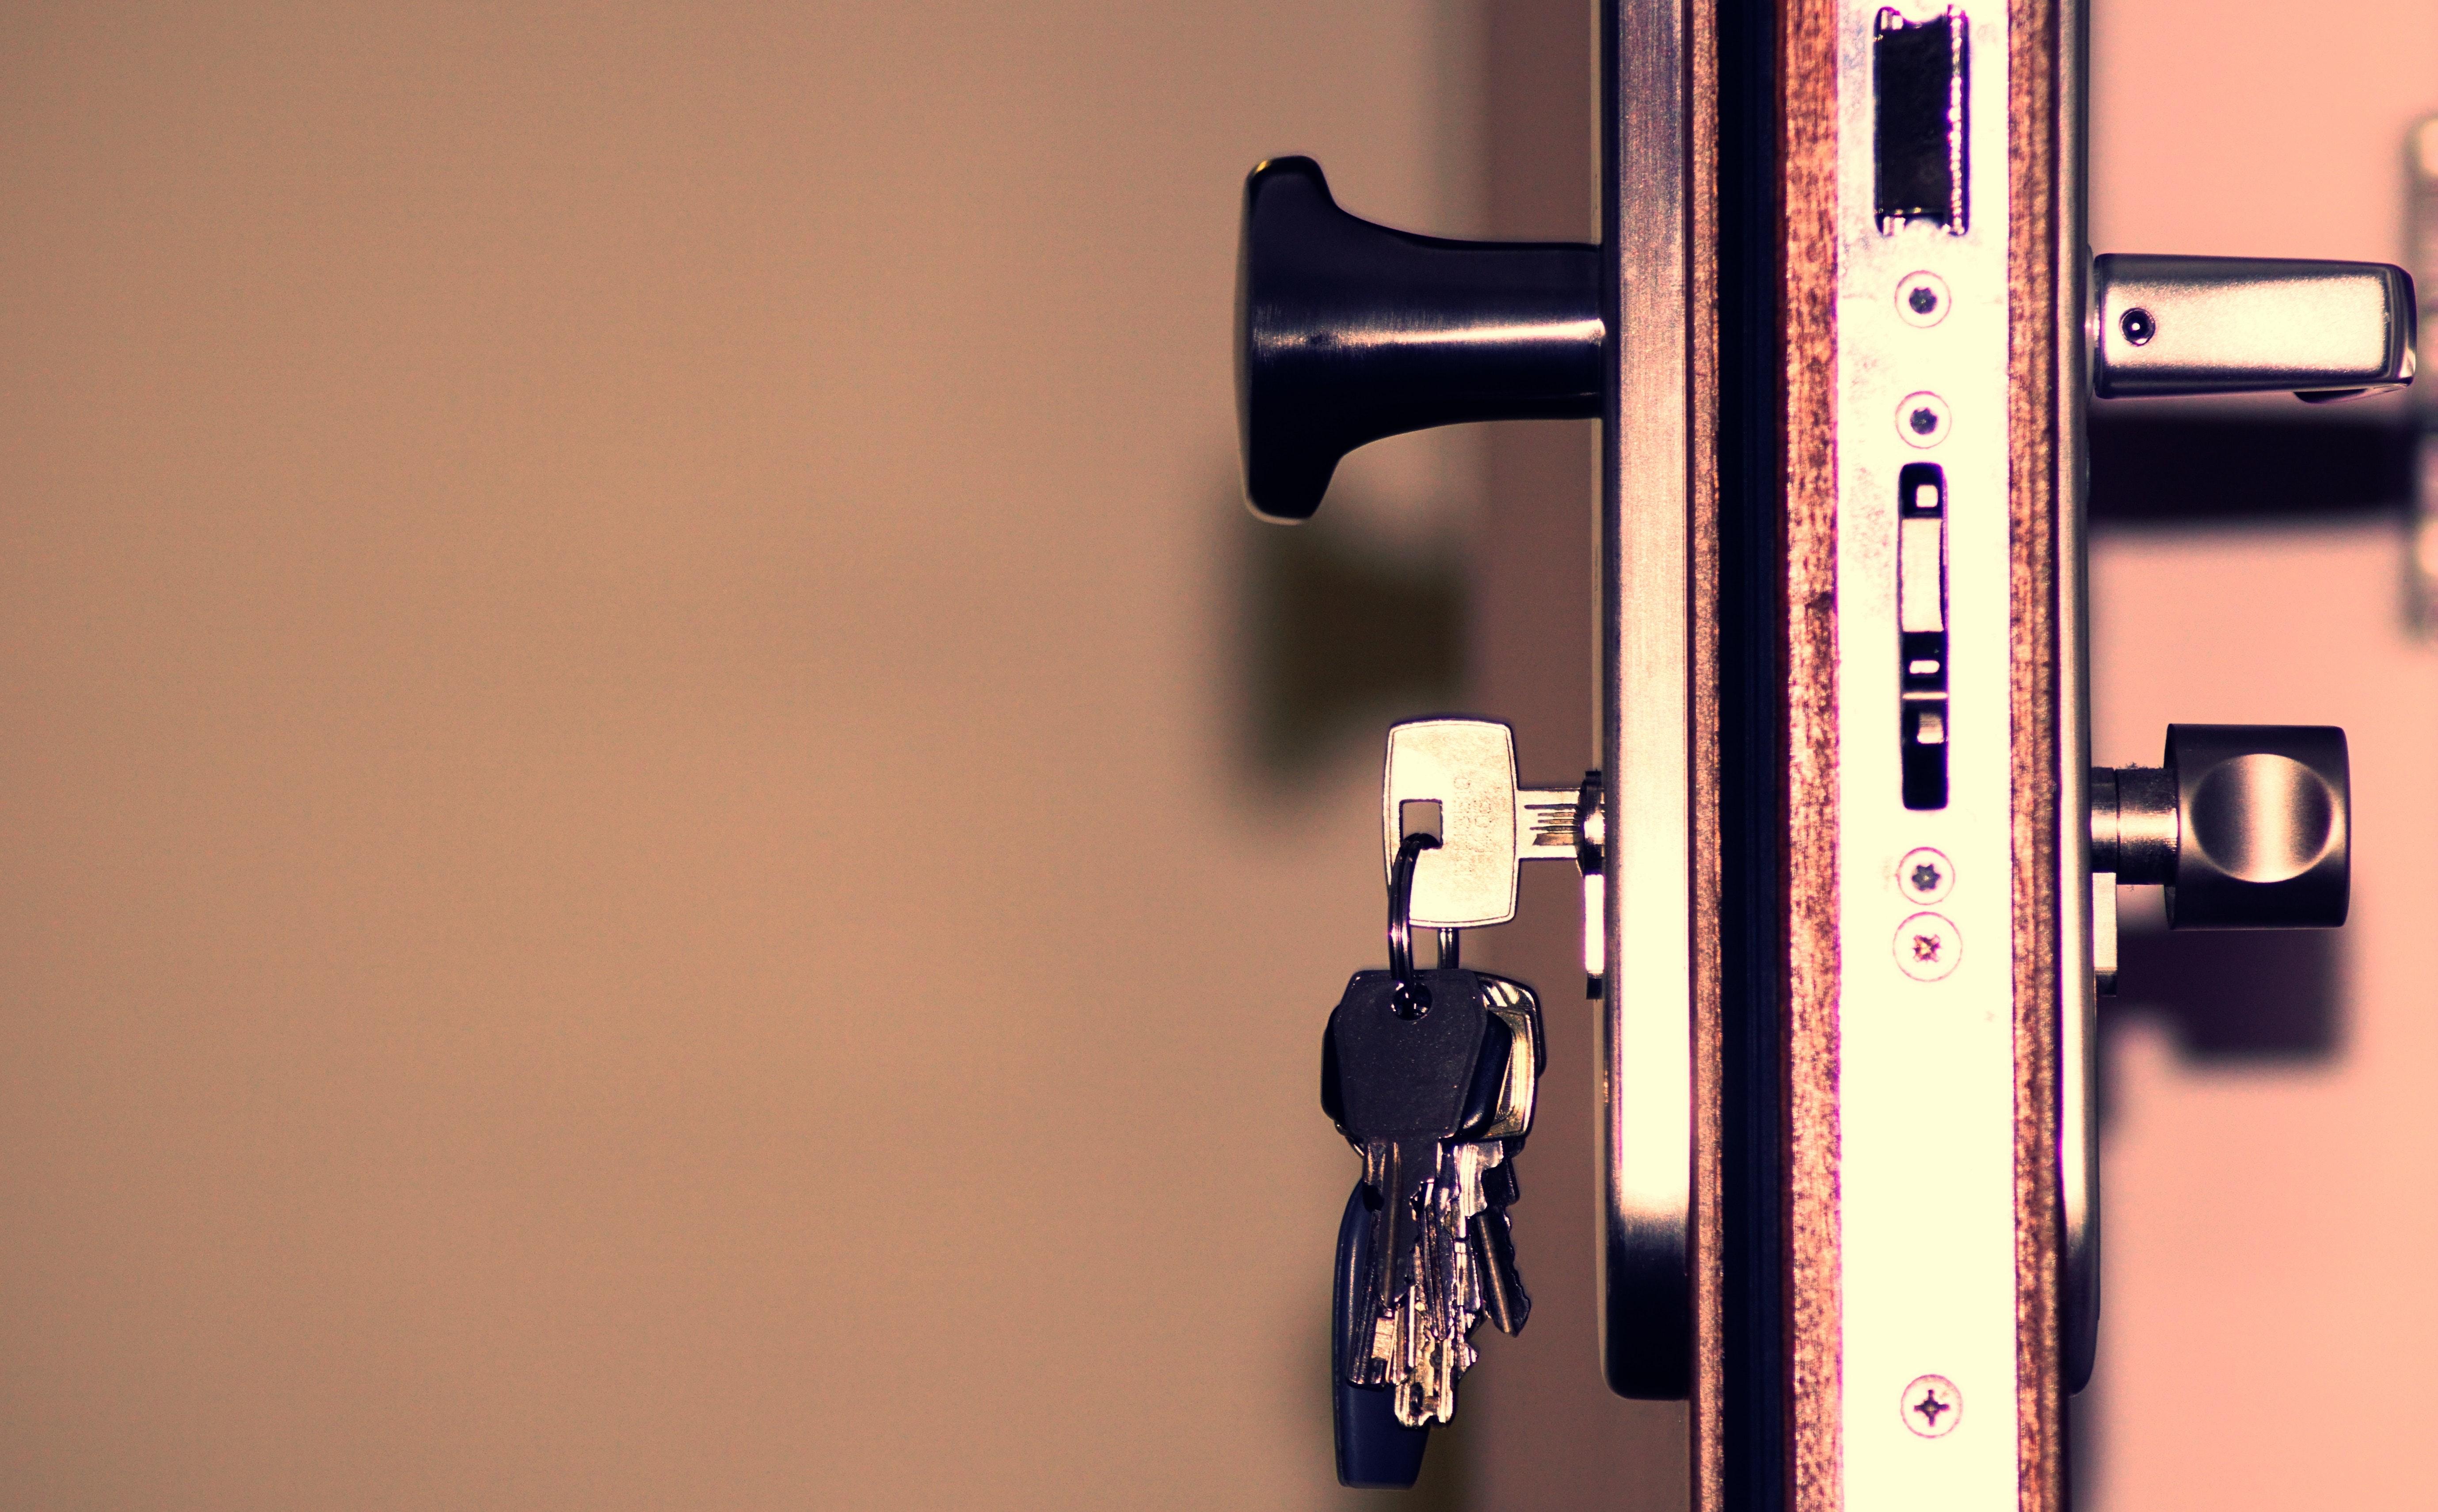 access-close-up-door-792034